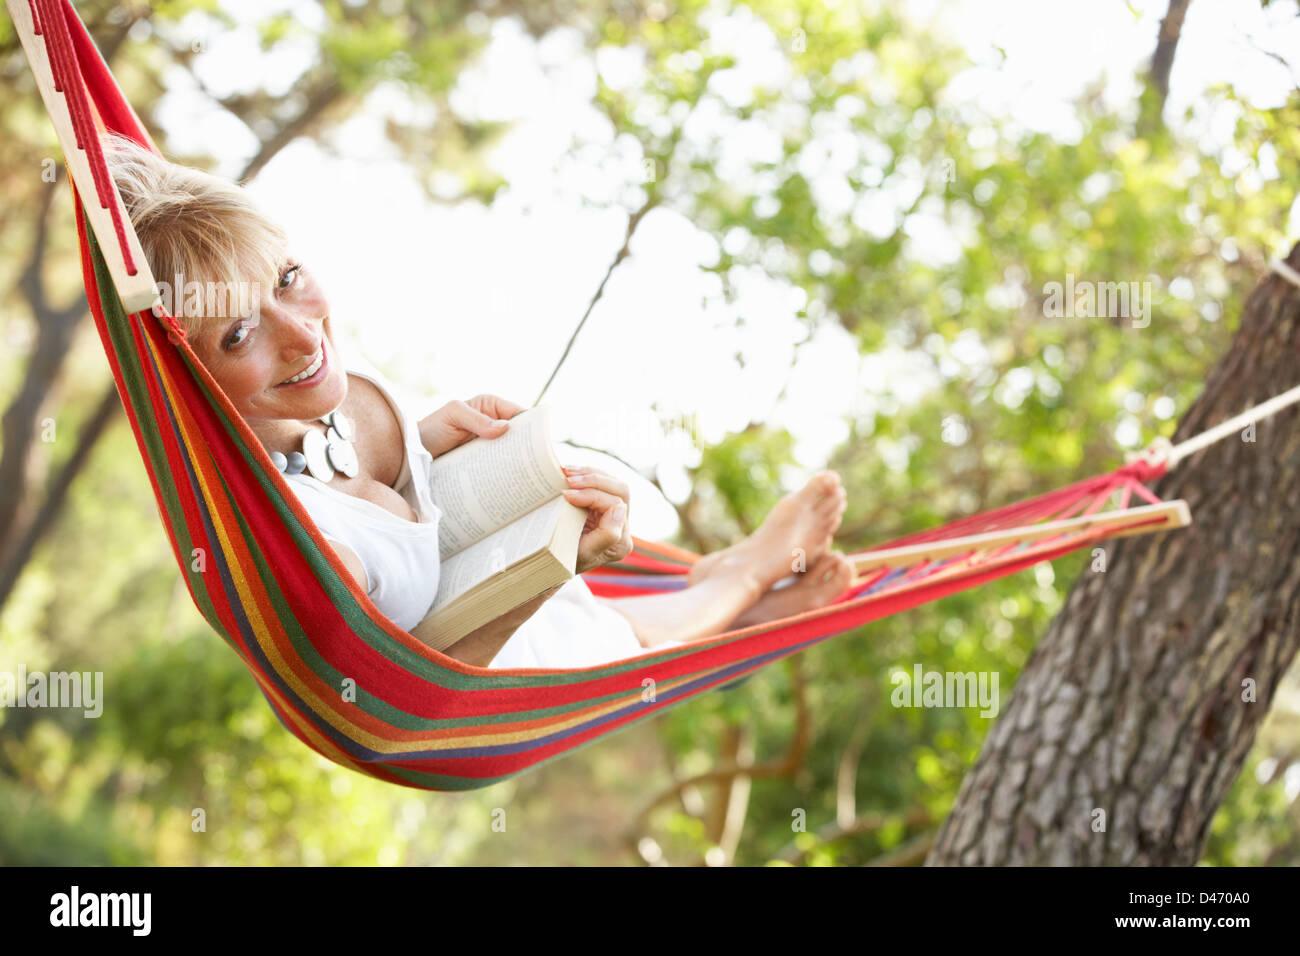 Senior Woman Relaxing In Hammock - Stock Image